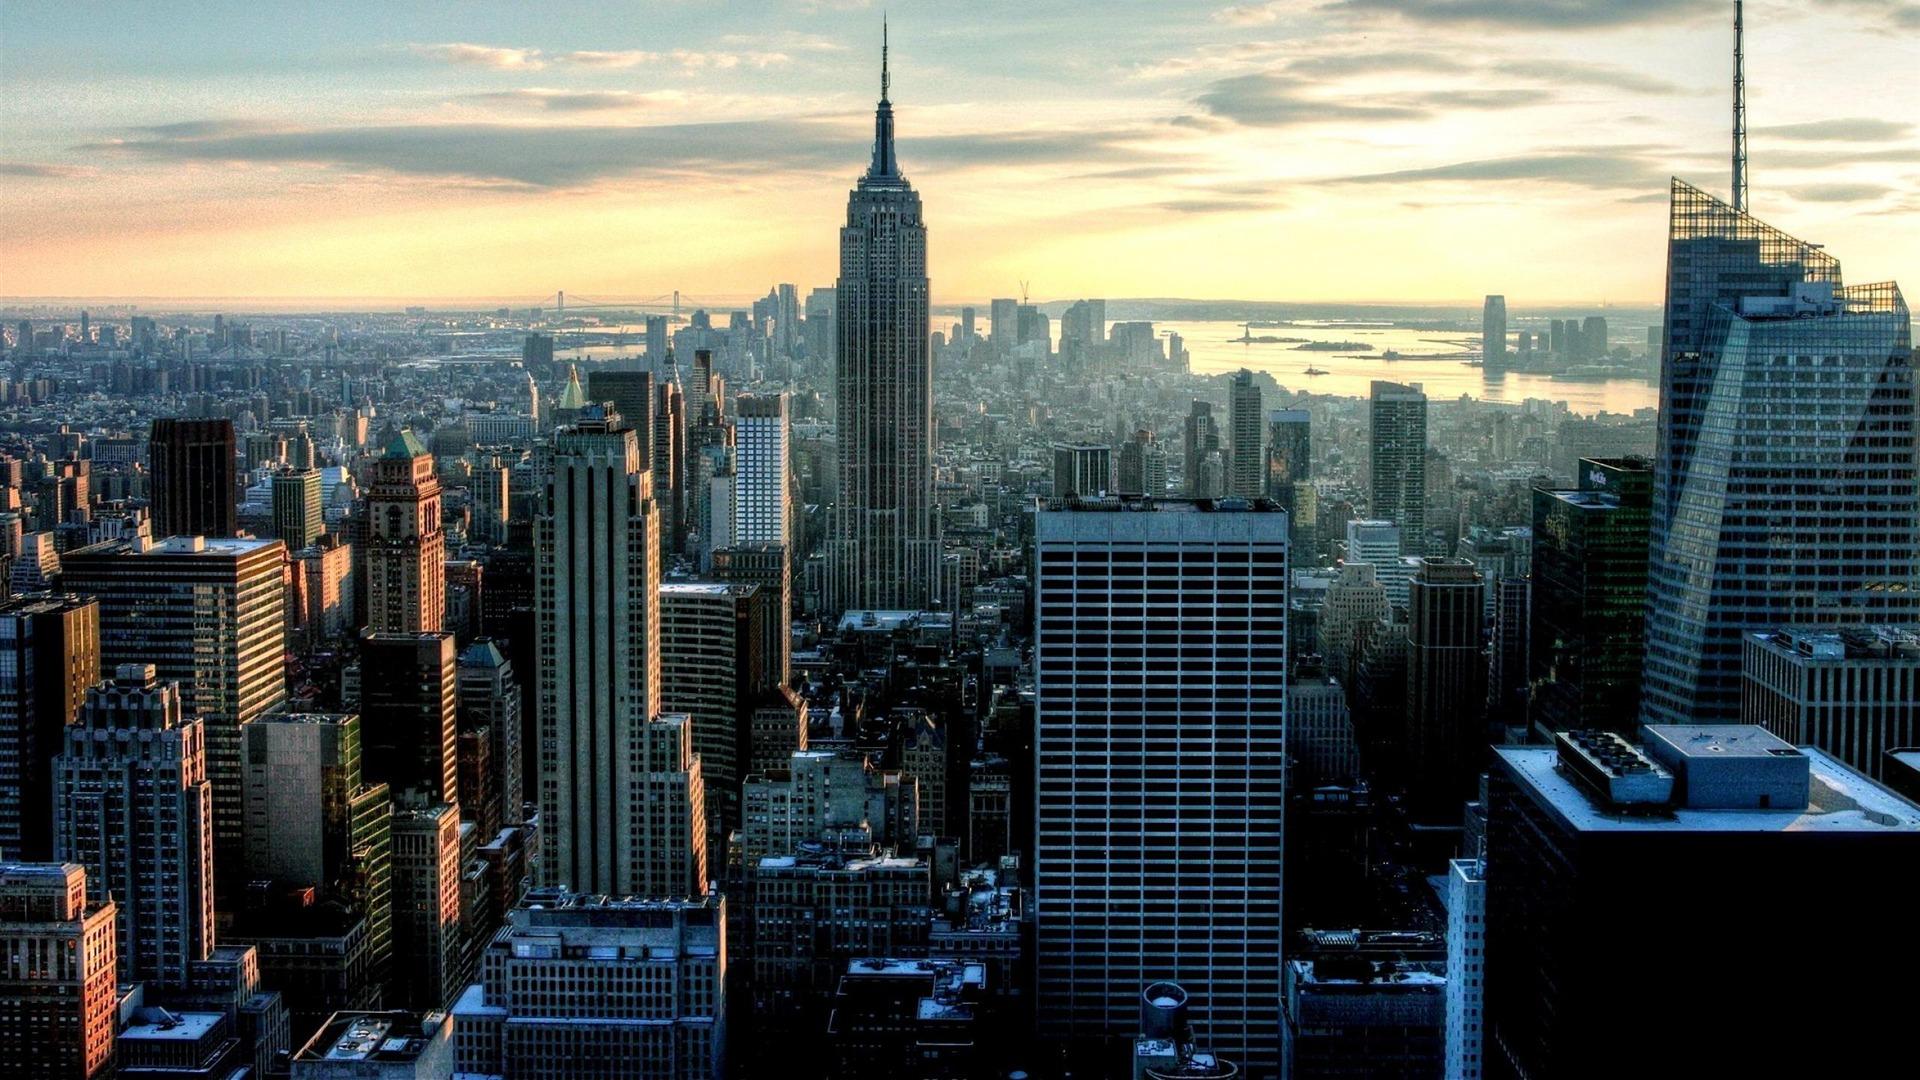 New York City - HD Wallpaper